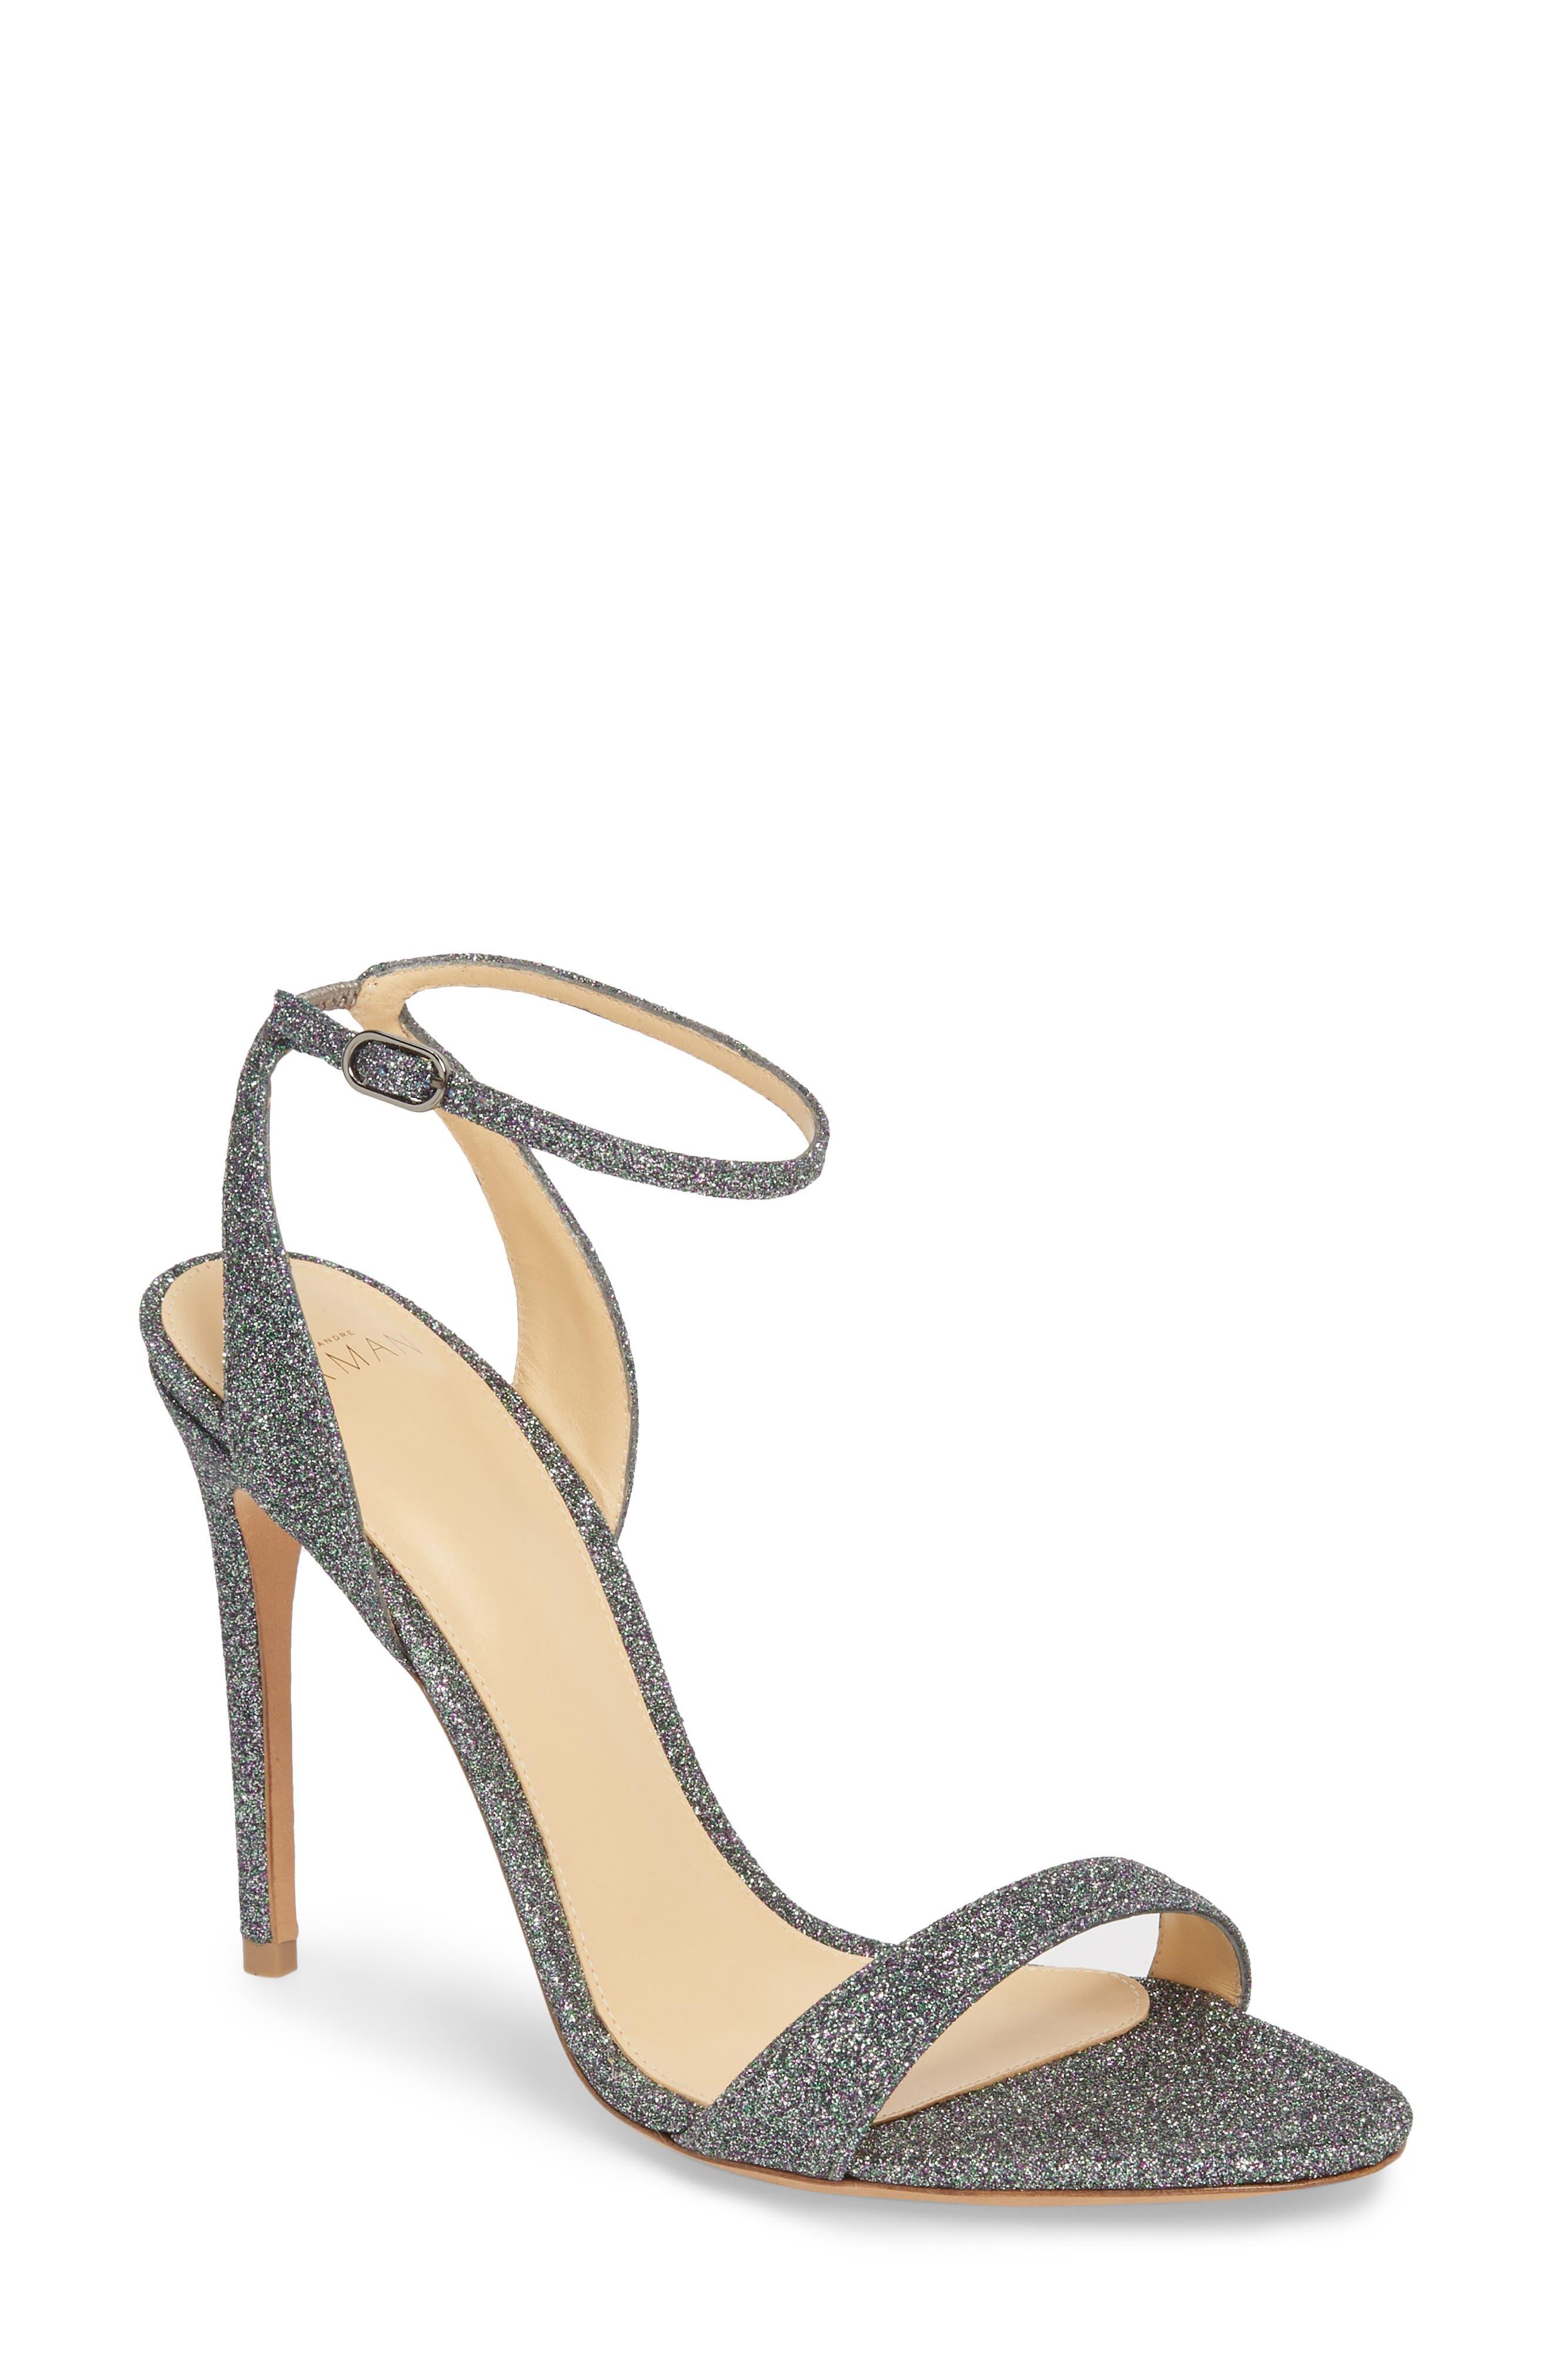 Santine Ankle Strap Sandal,                         Main,                         color, 040